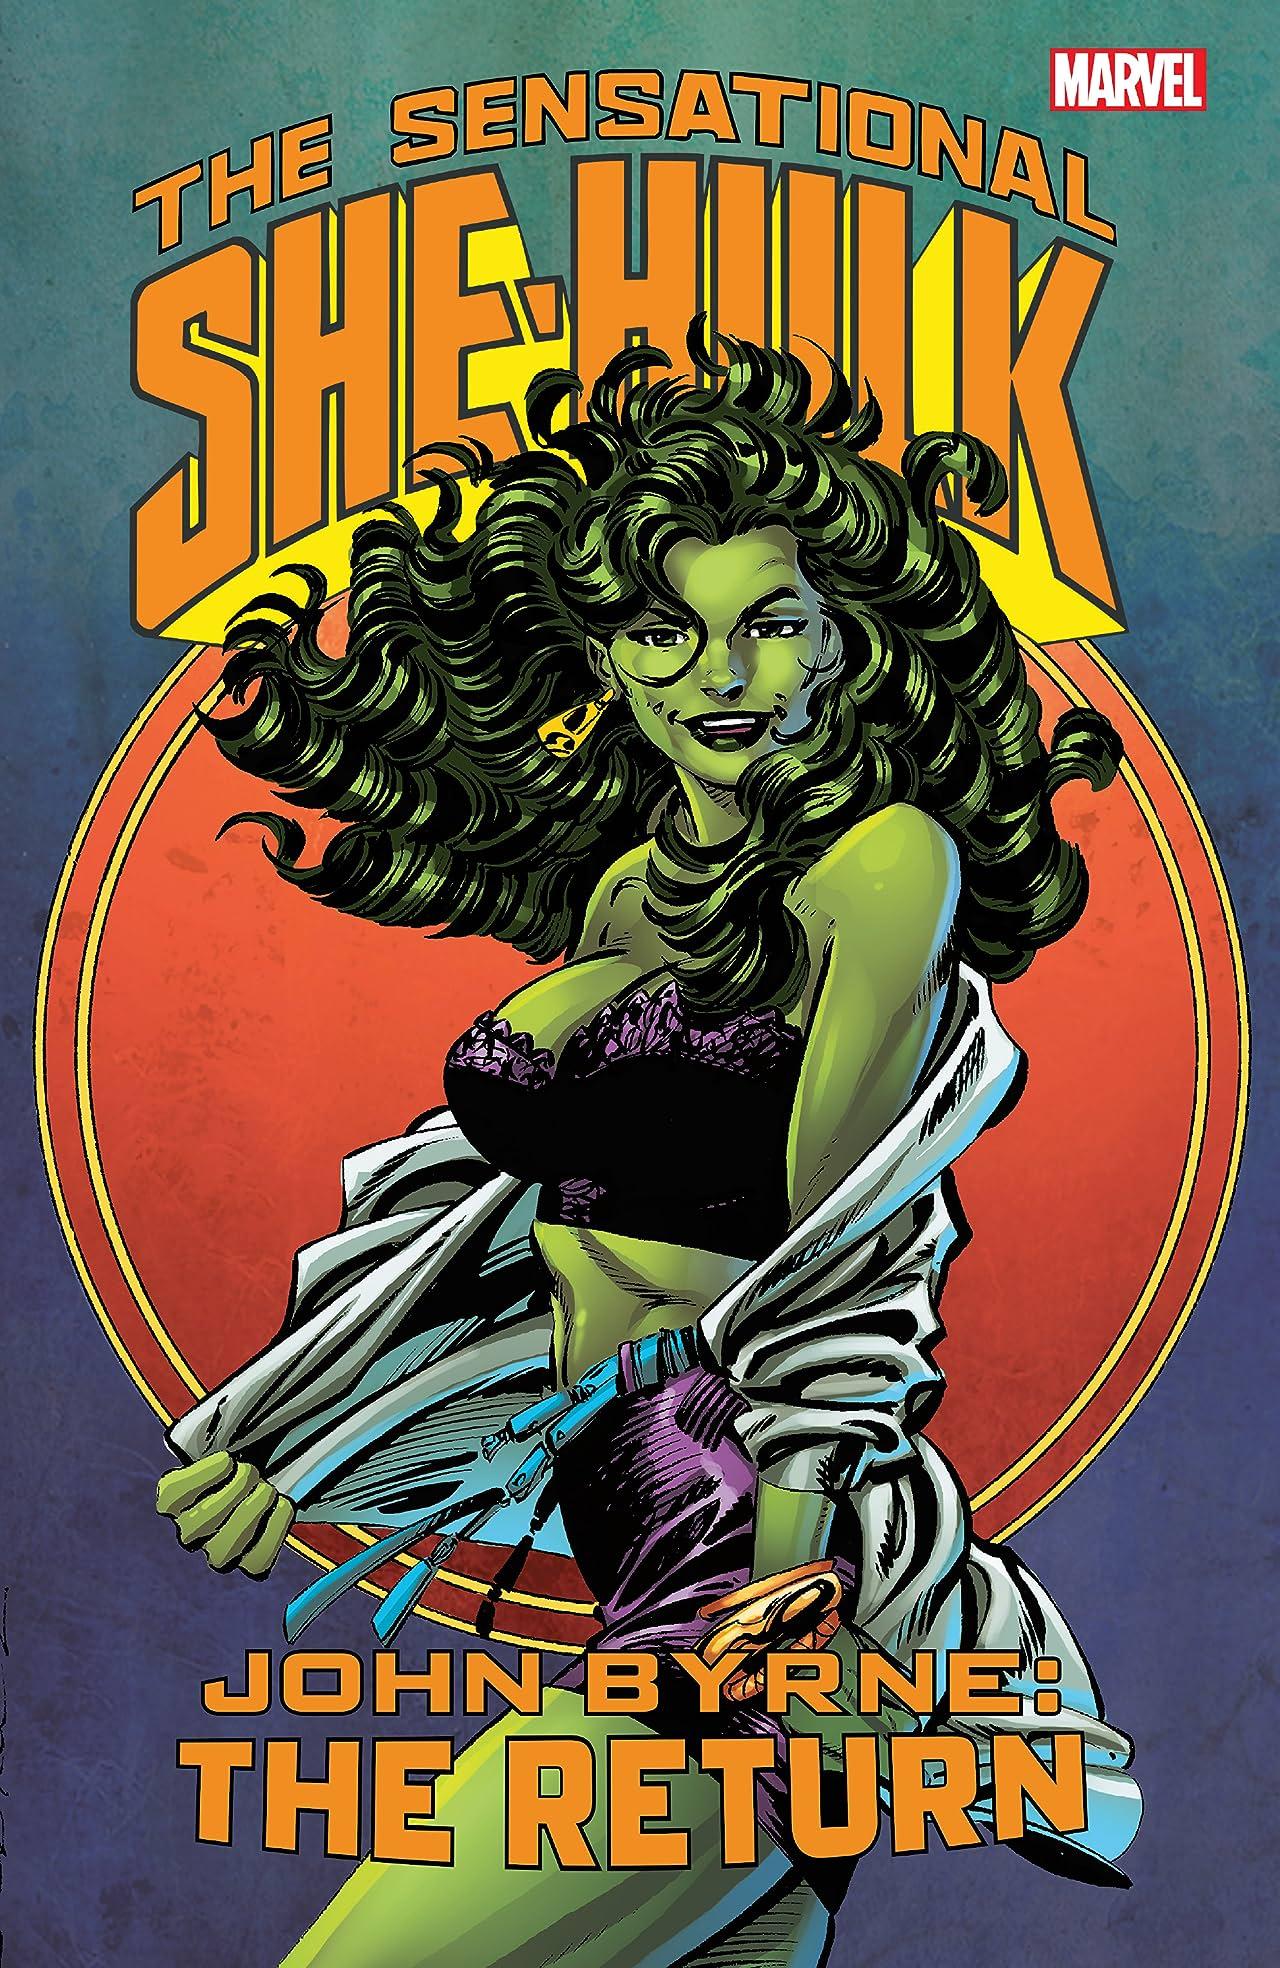 Sensational She-Hulk by John Byrne: The Return